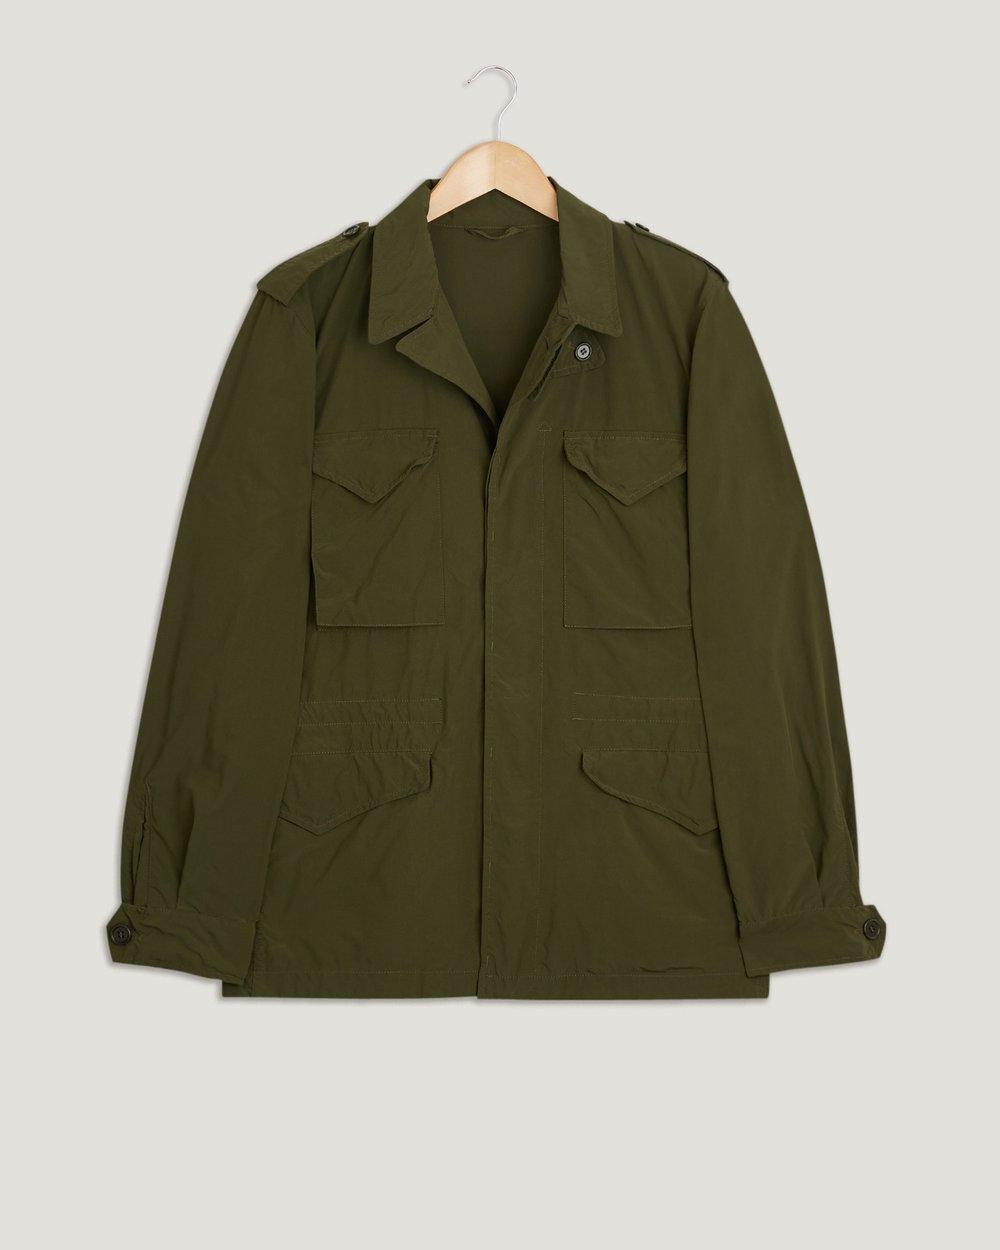 aspesi_shirt_field_jacket_olive_1.jpg